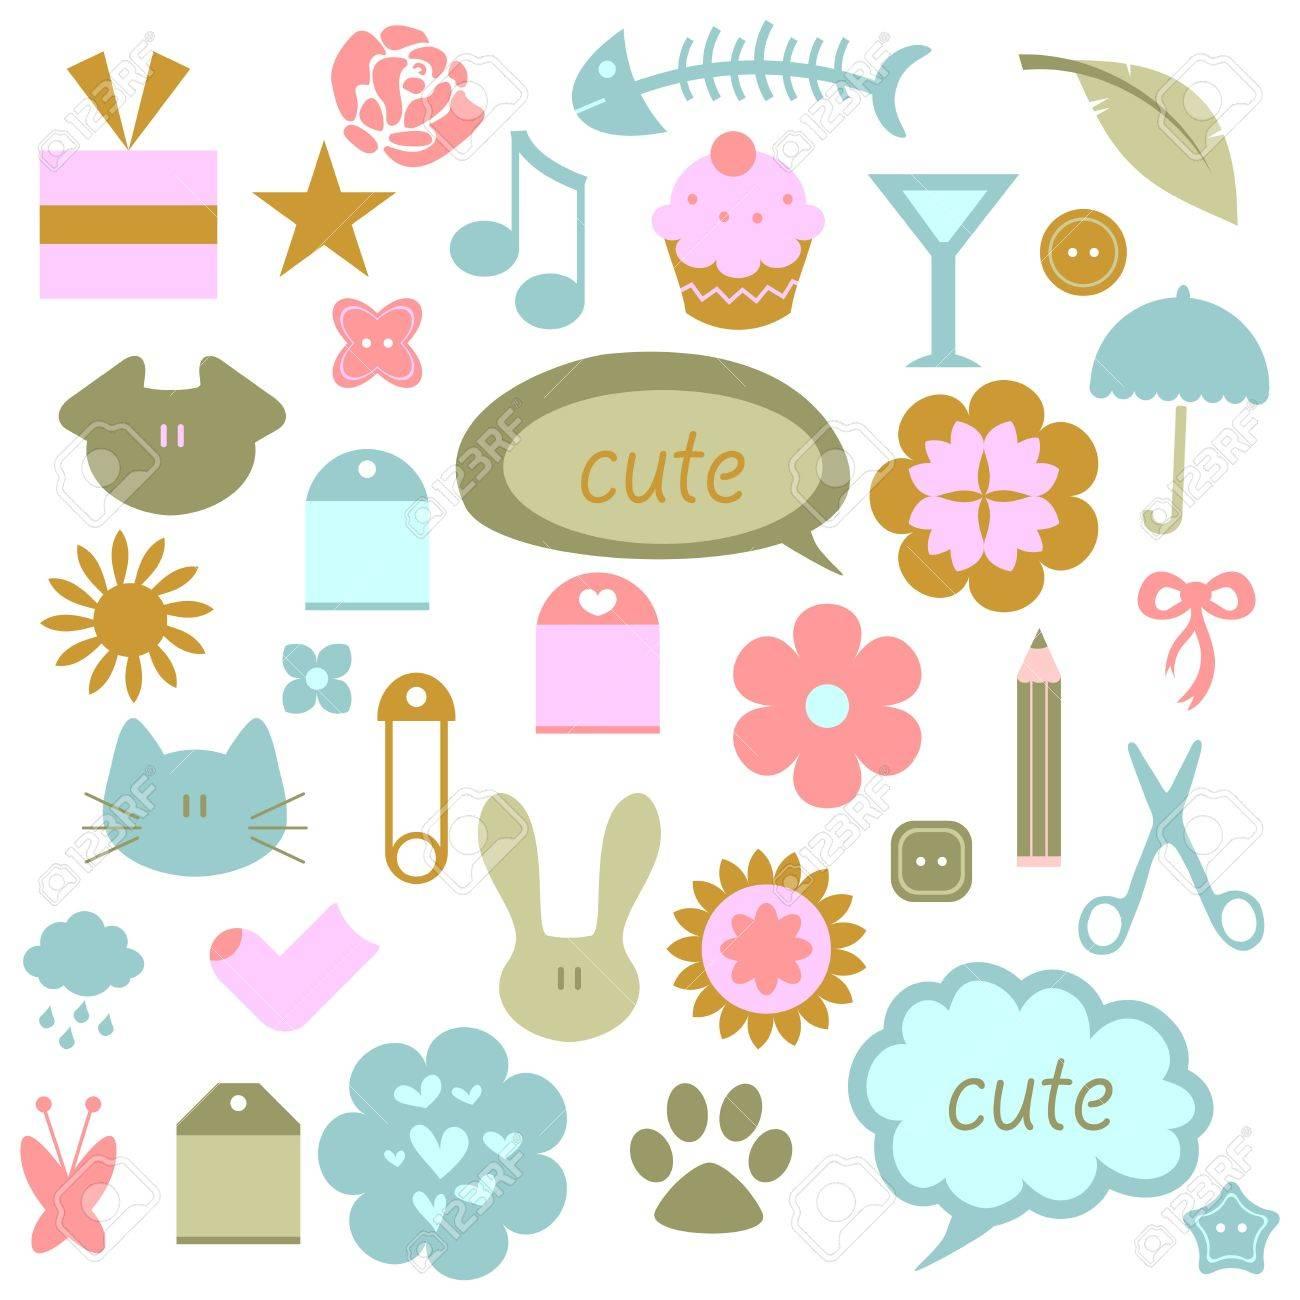 A set of cute babyish elements Stock Vector - 15638344